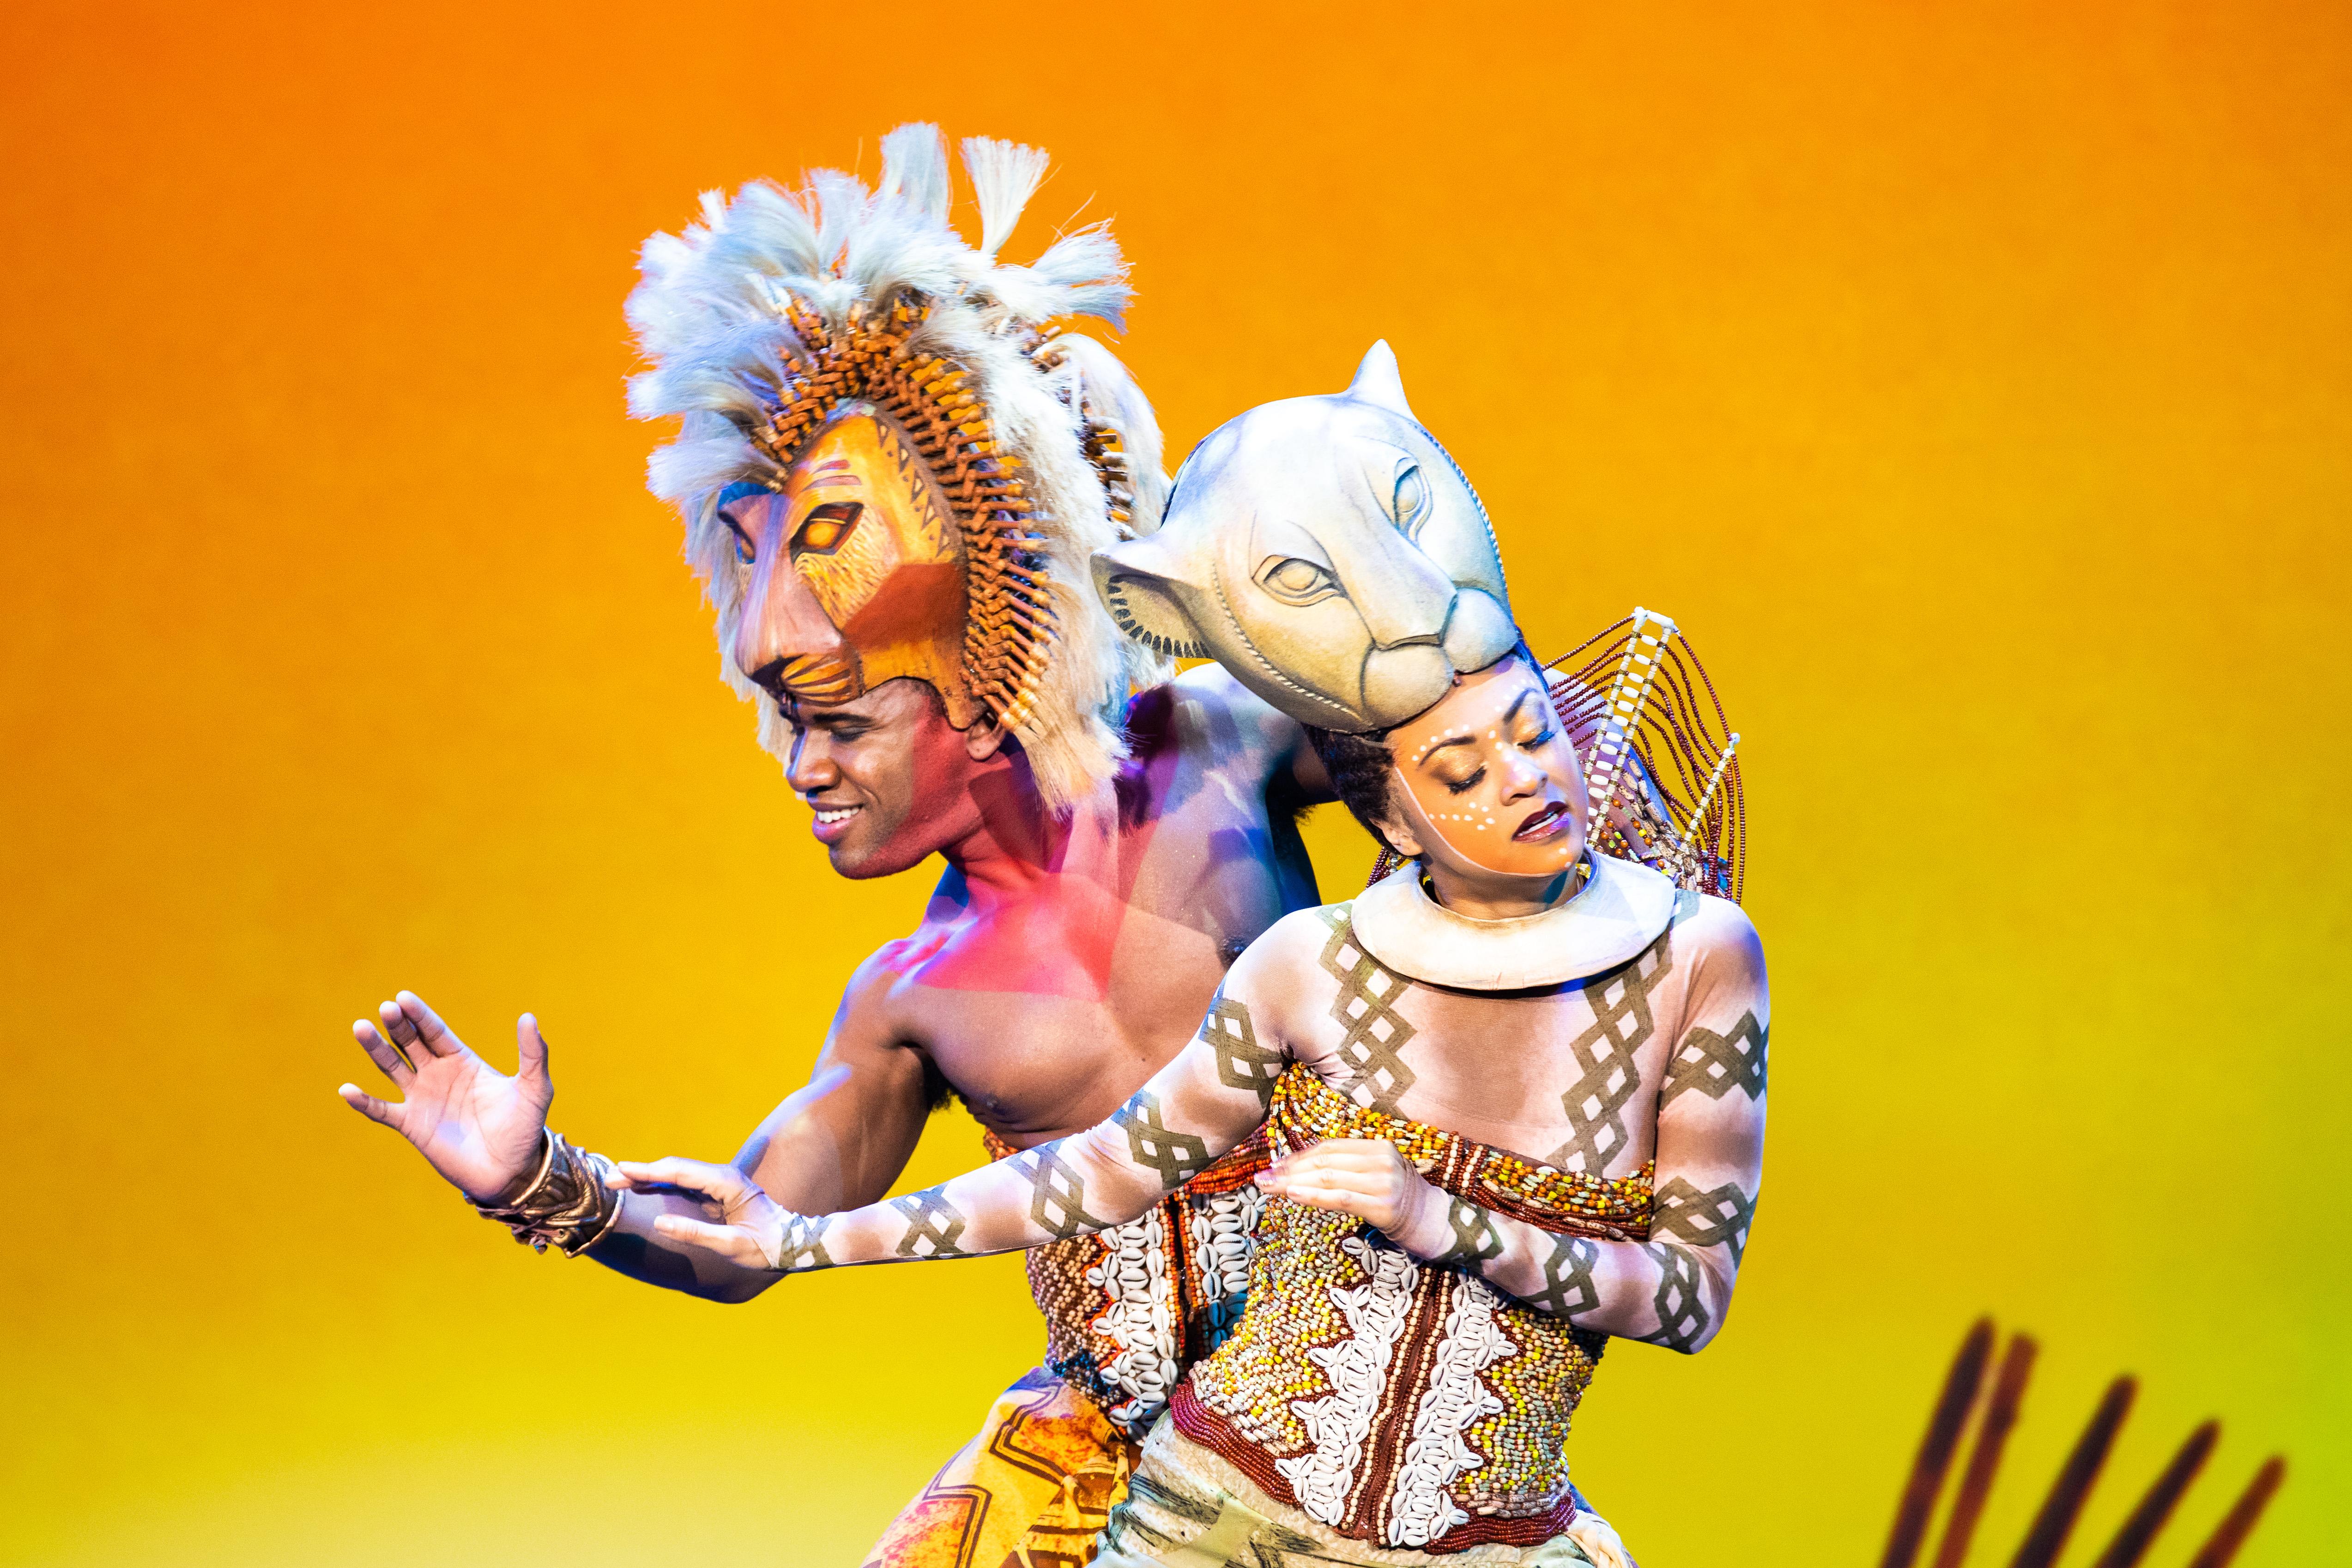 SImba+ Nala: Simba played by Dashaun Young / Photo by Dina Douglass